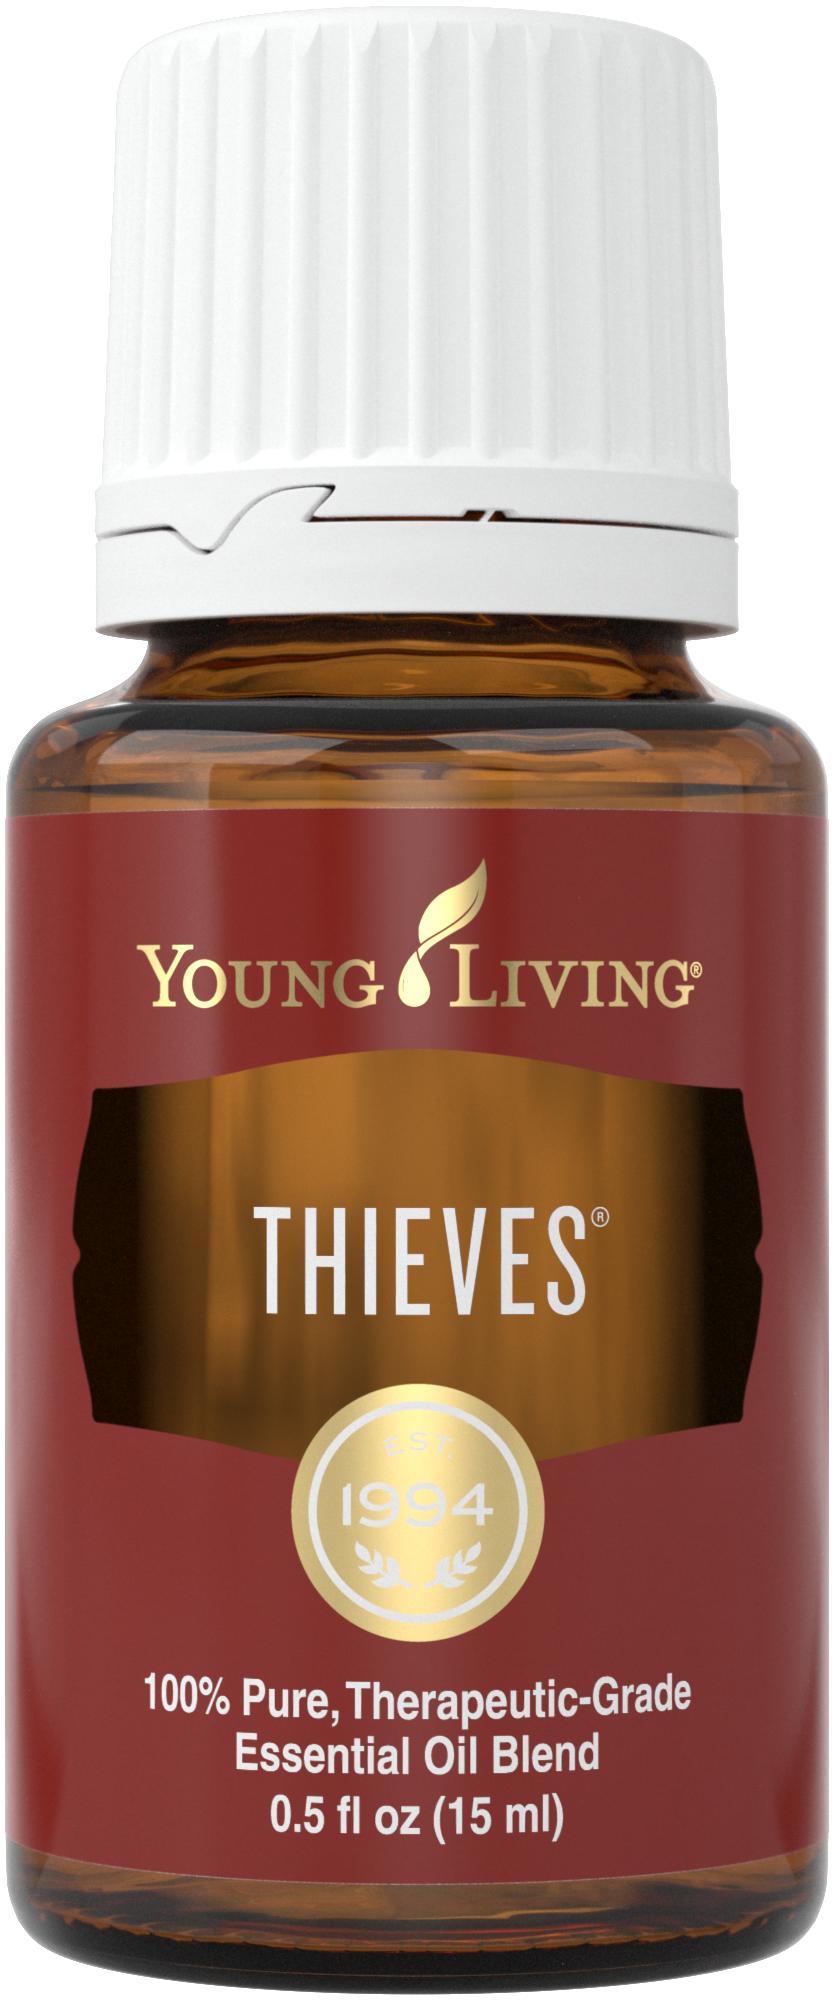 thieves_15ml_silo_us_2016_23899000964_o.png